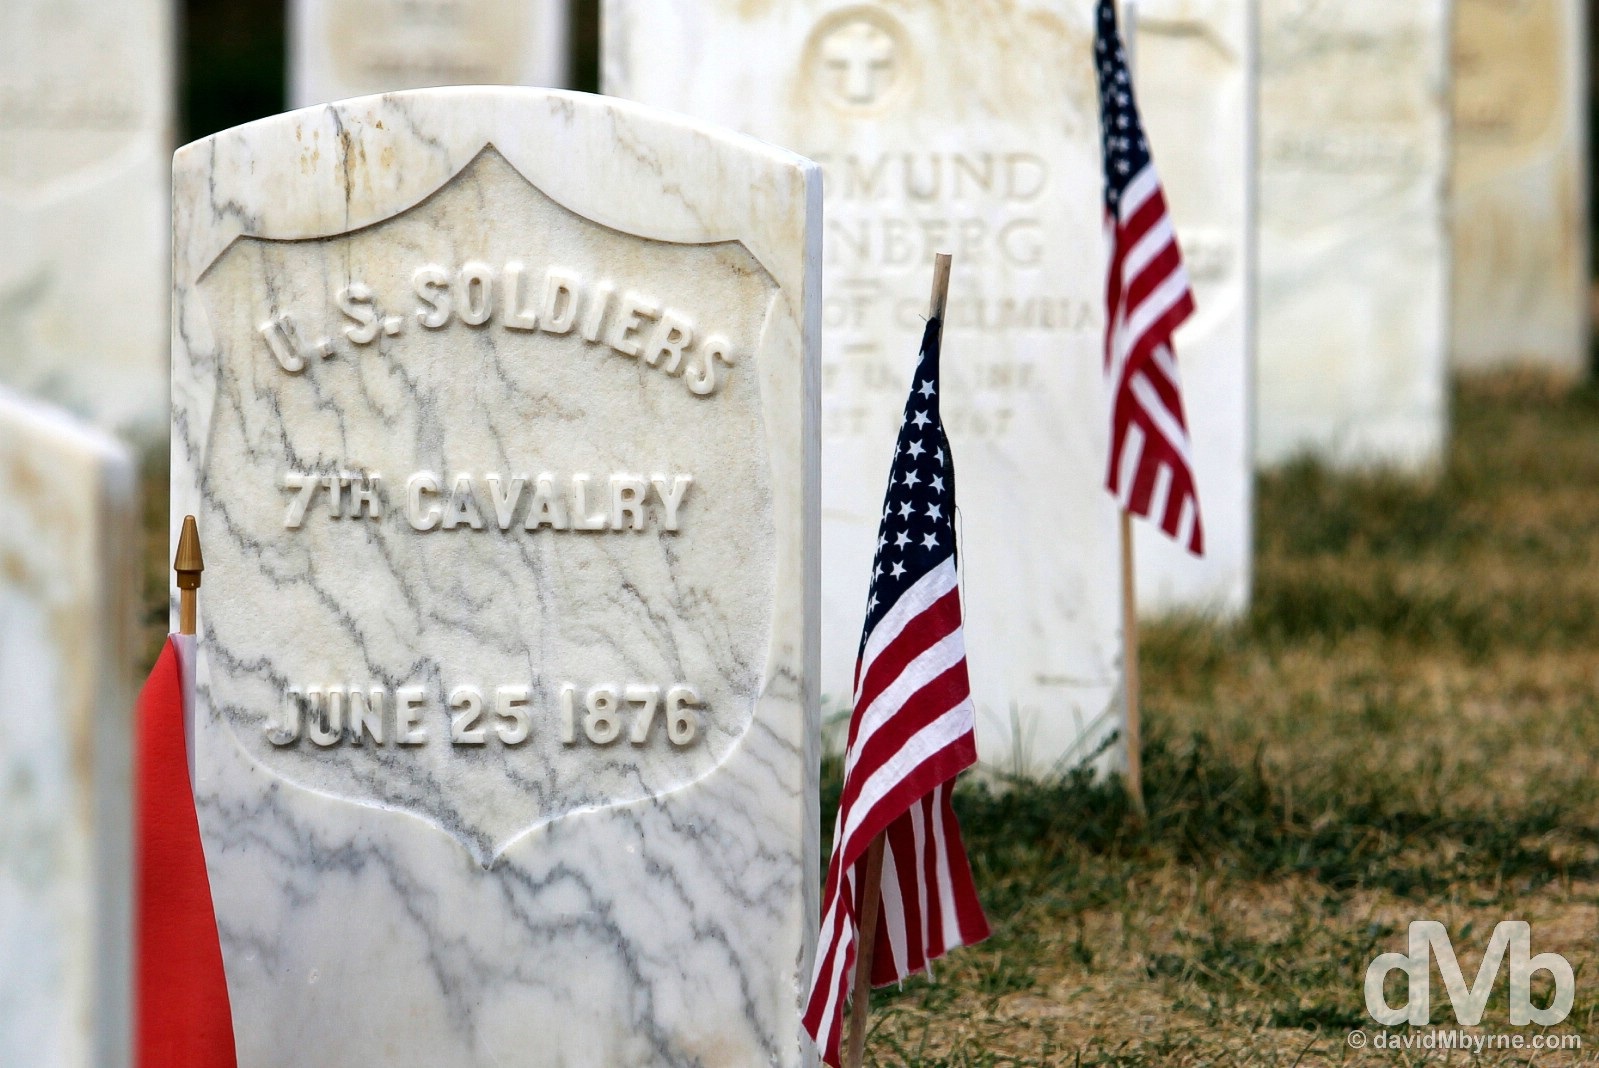 7th Cavalry marker stone, Little Bighorn Battlefield National Monument, Montana, USA. September 3, 2016.